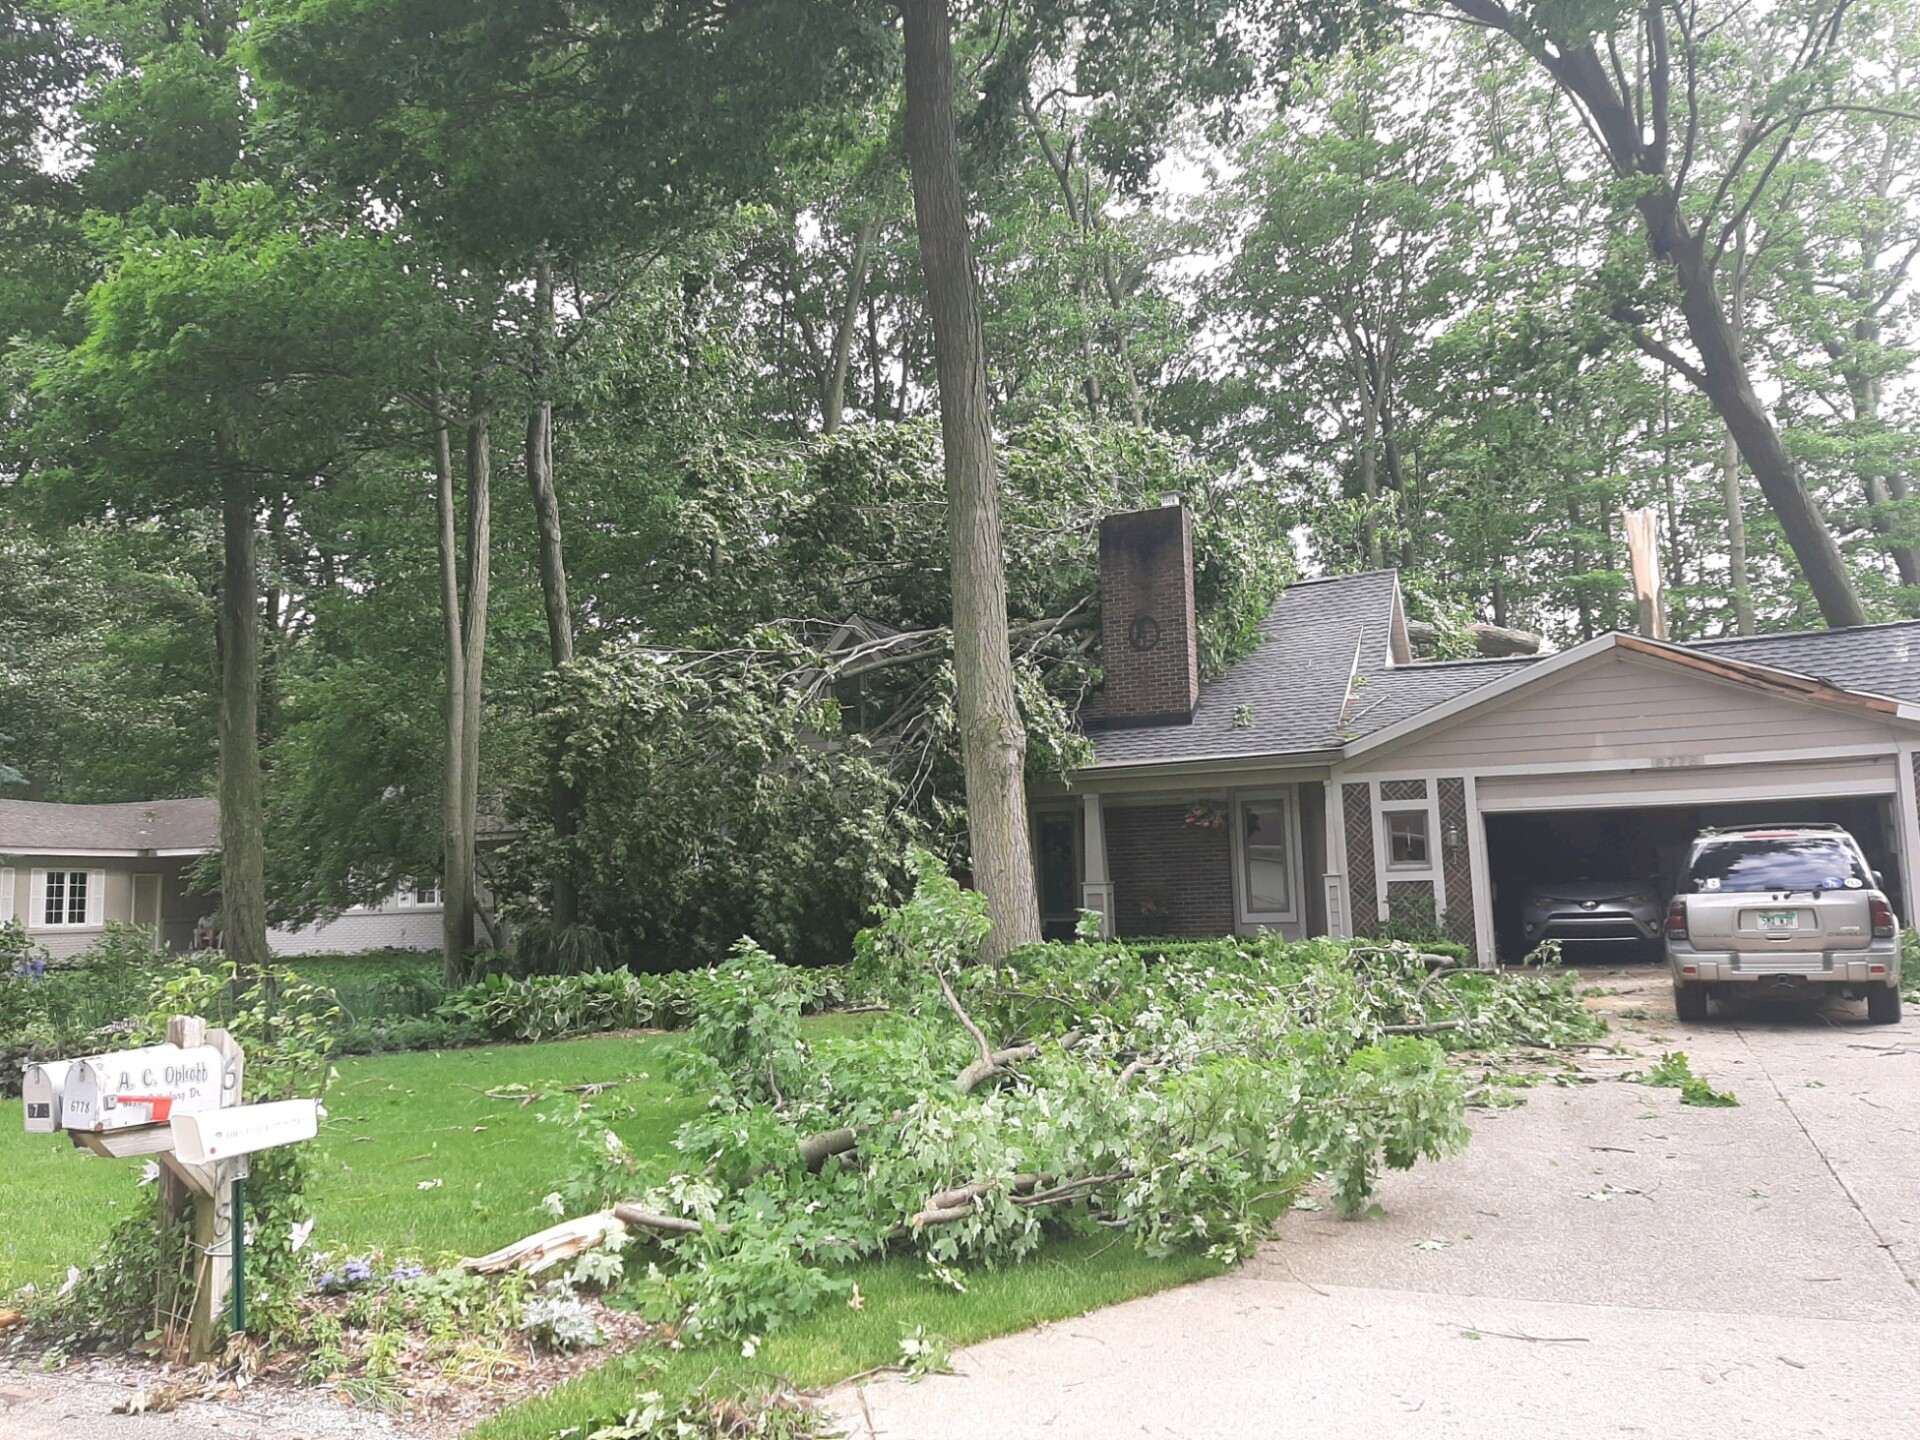 Gerogetown township storm damage 2.jpg